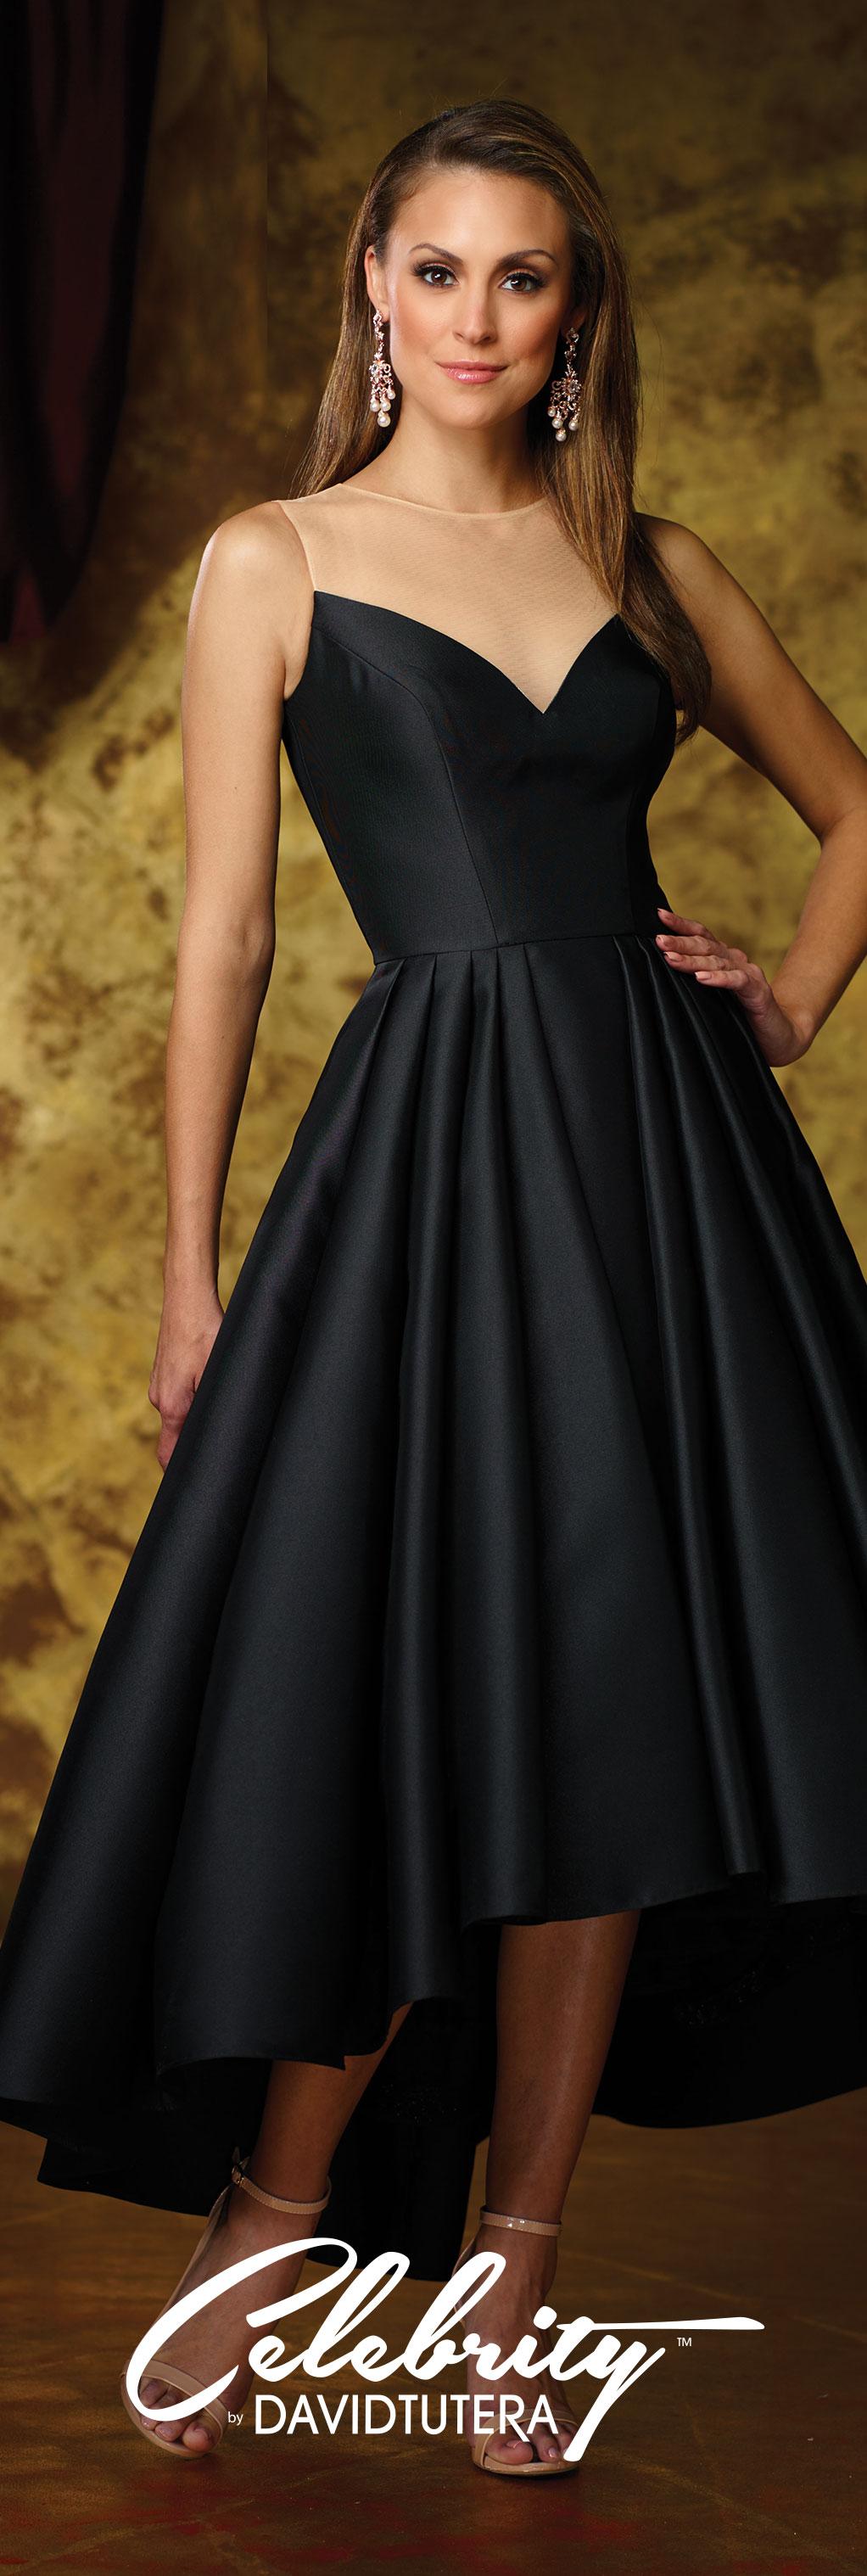 Mon Cheri Bridals Mother Of The Bride Dresses Flower Girl Dresses Modest Bride Dresses Davids Bridal Gowns Black Long Dress Elegant Long Black Dress [ 3036 x 1022 Pixel ]